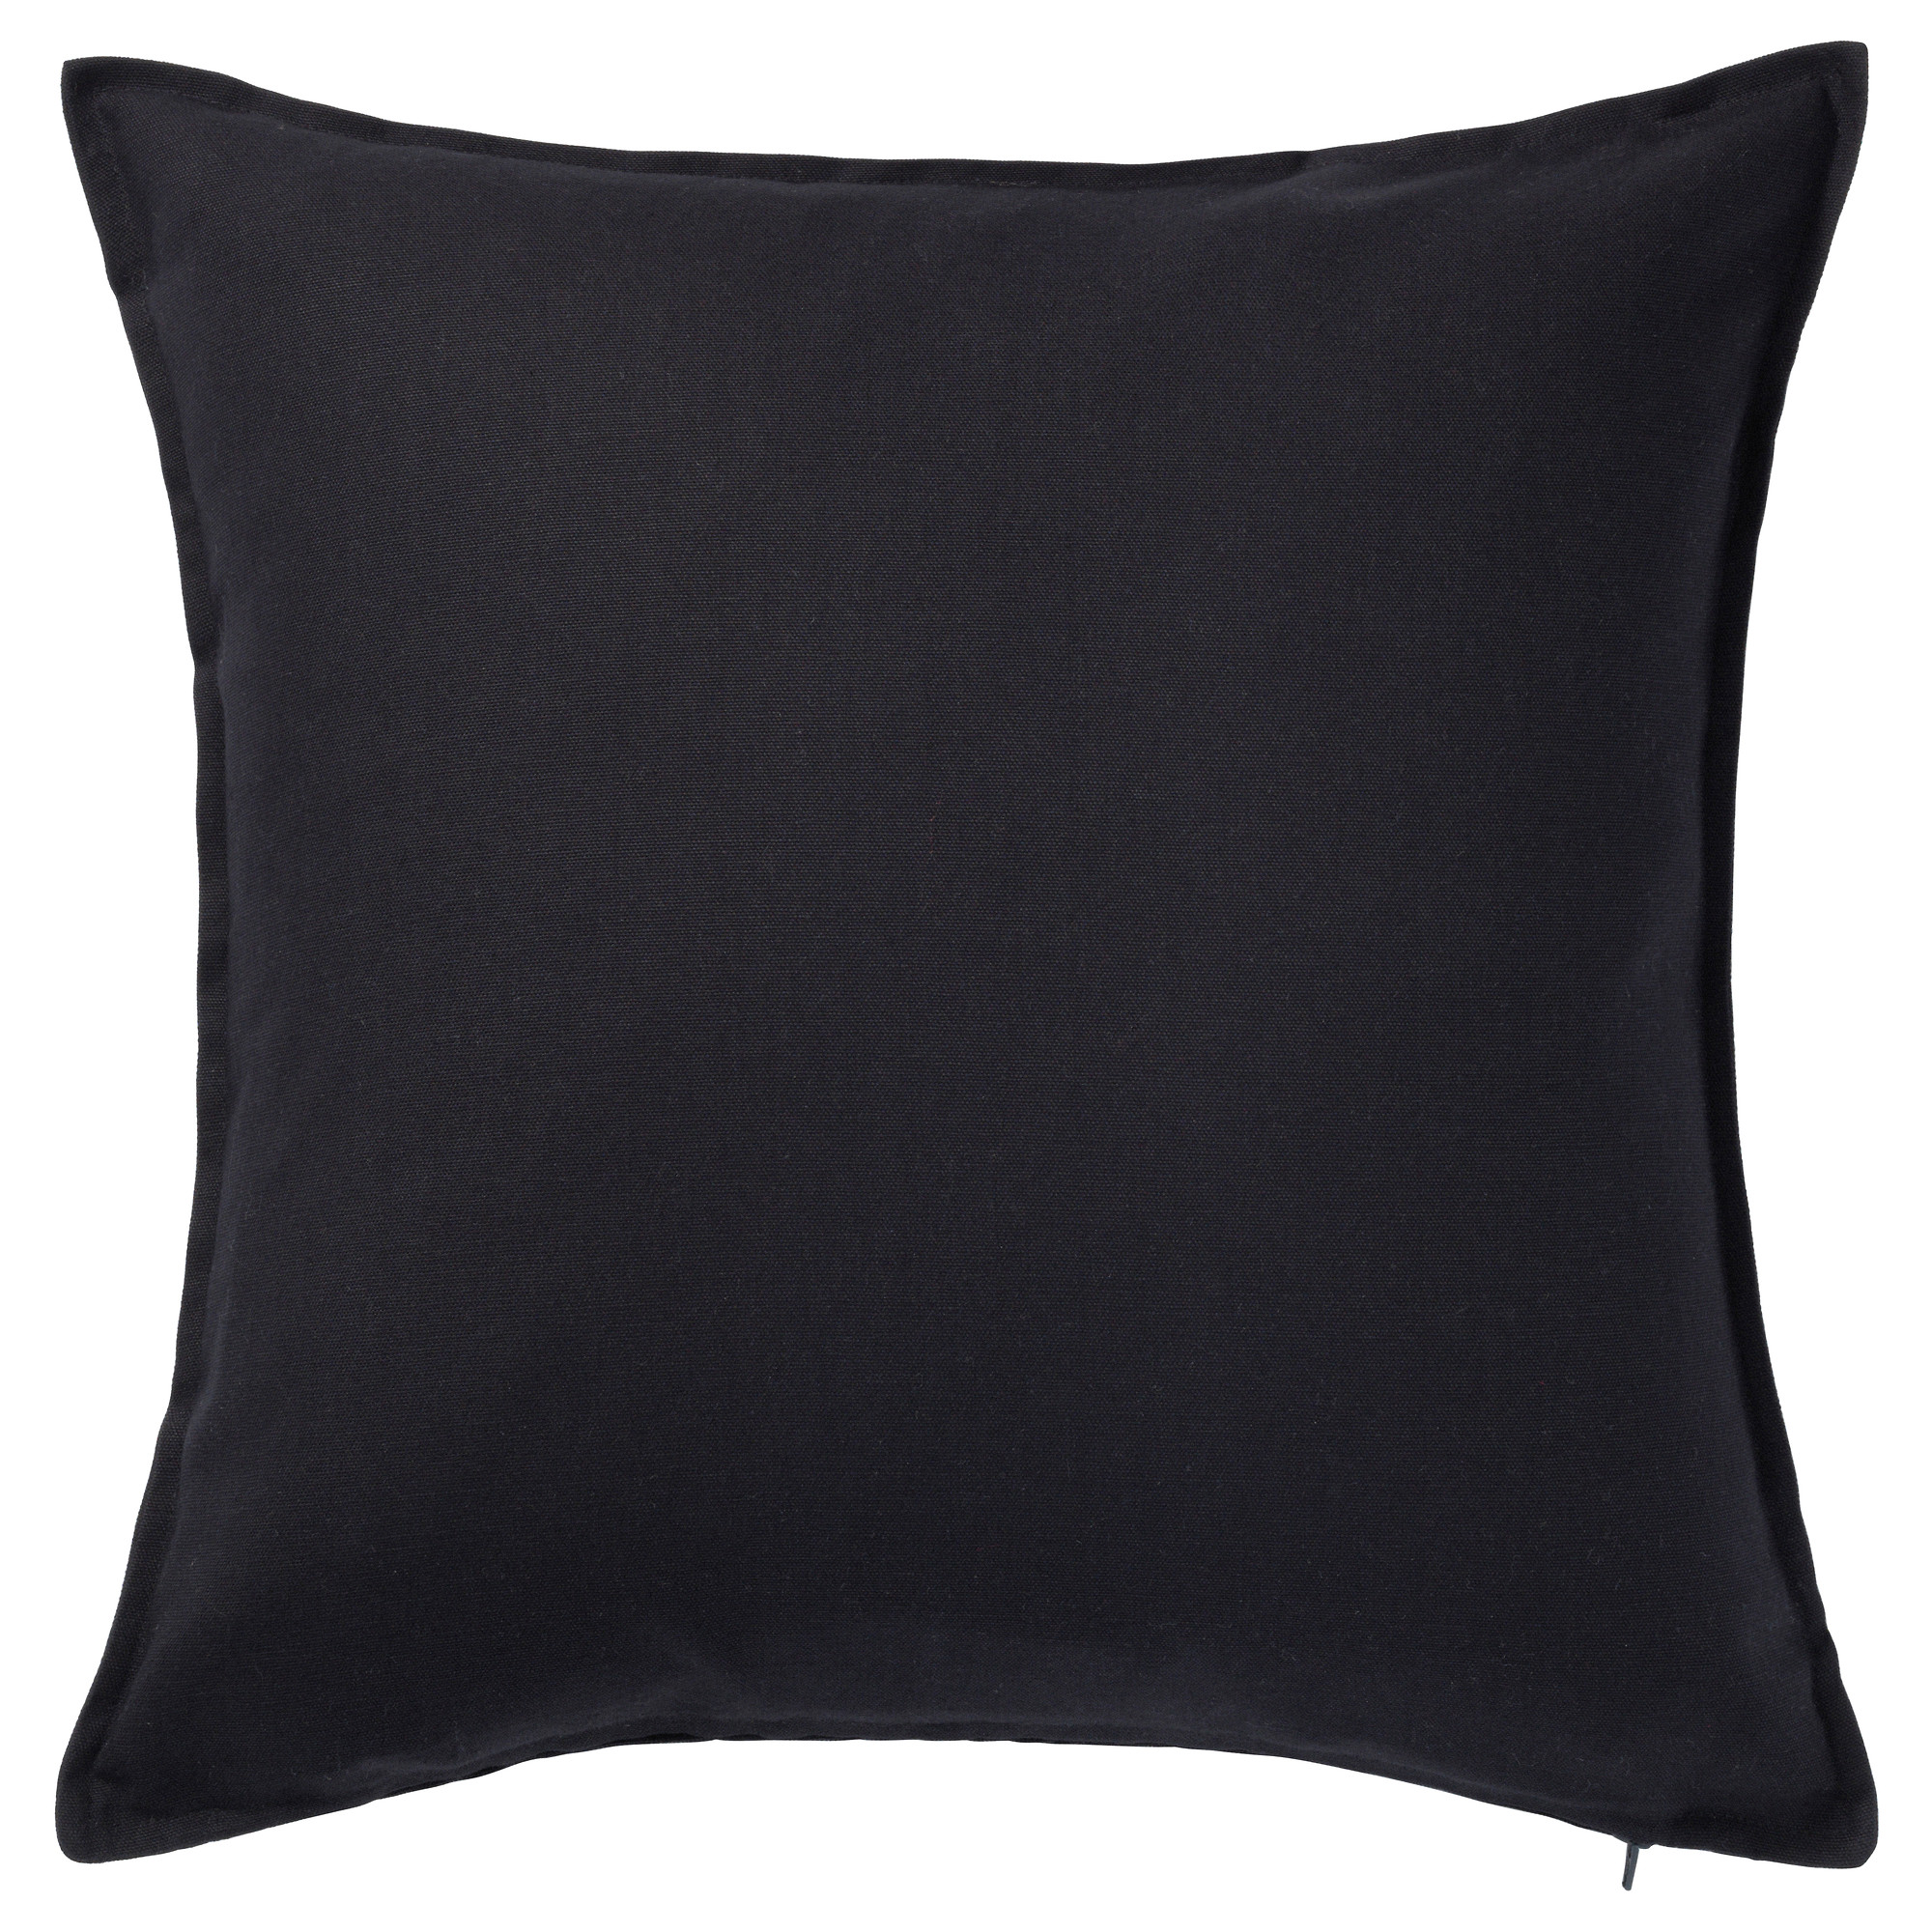 60281139 Gurli Cushions - Cushion Covers IKEA khmer in phnom penh cambodia